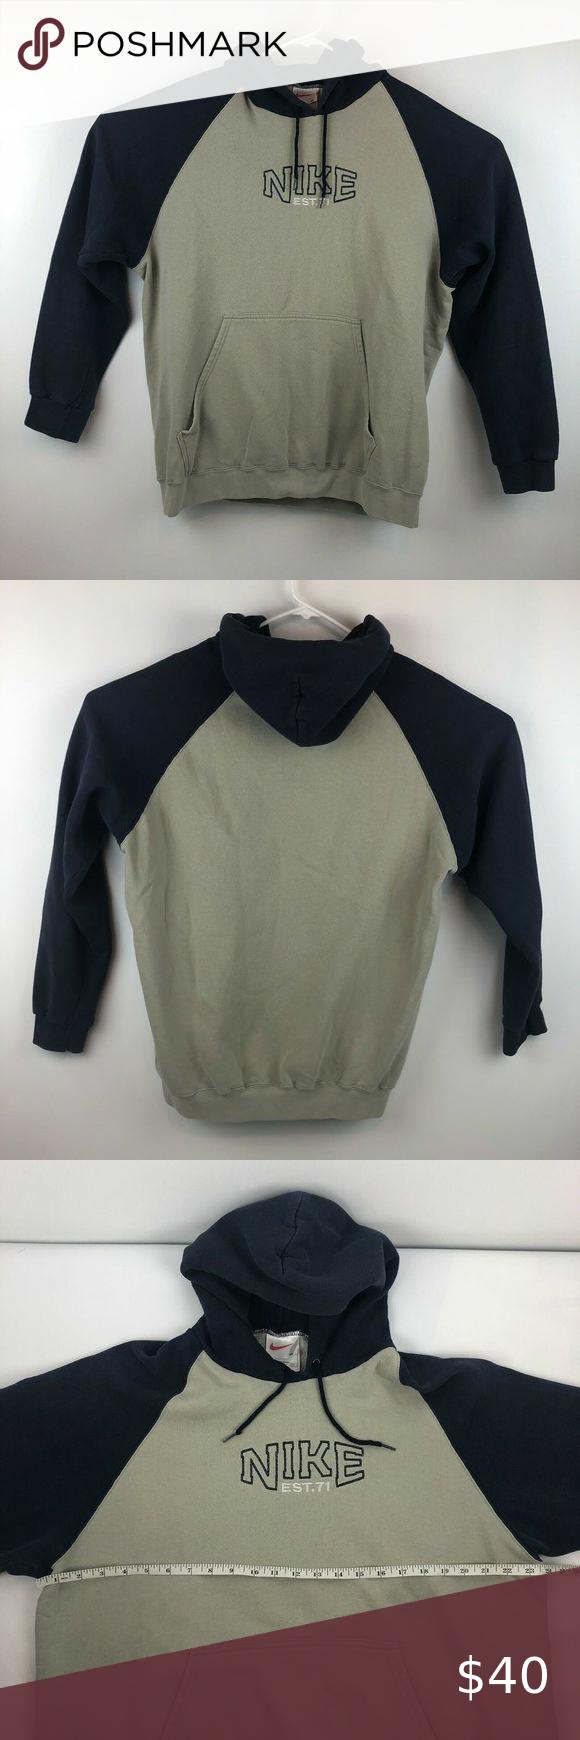 Vtg 90 S Nike White Tag Spell Out Hoodie Size Xl White Nikes Hoodies Sweatshirt Shirt [ 1740 x 580 Pixel ]